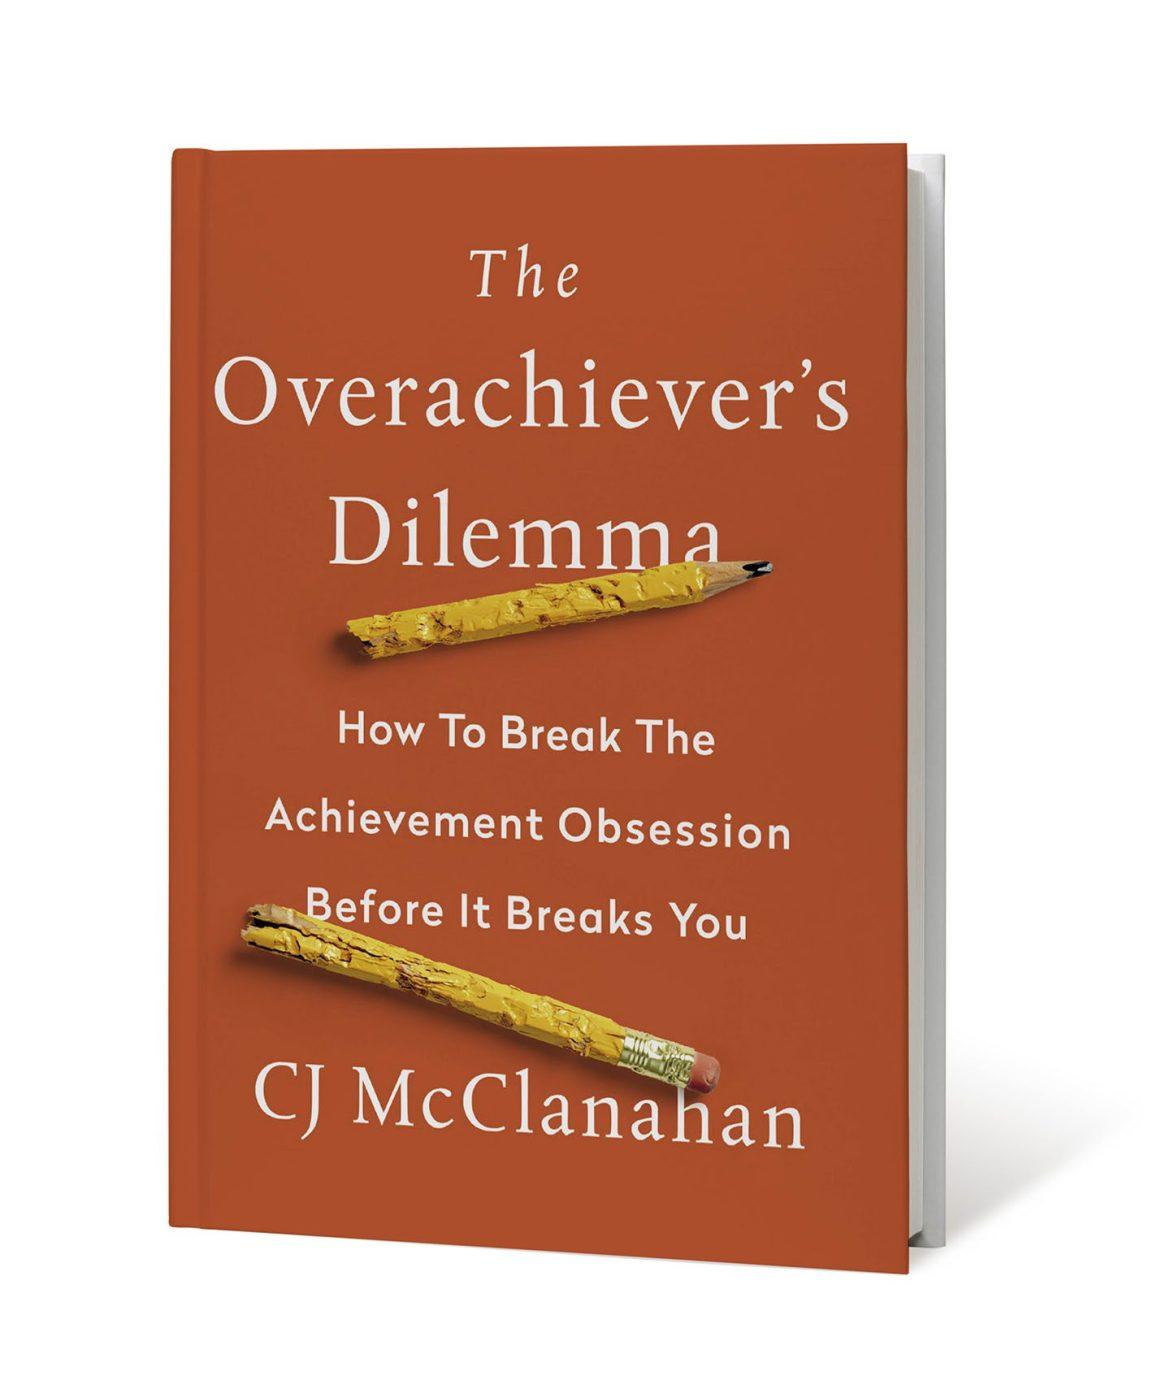 overachievers-dilemma-book-amazon